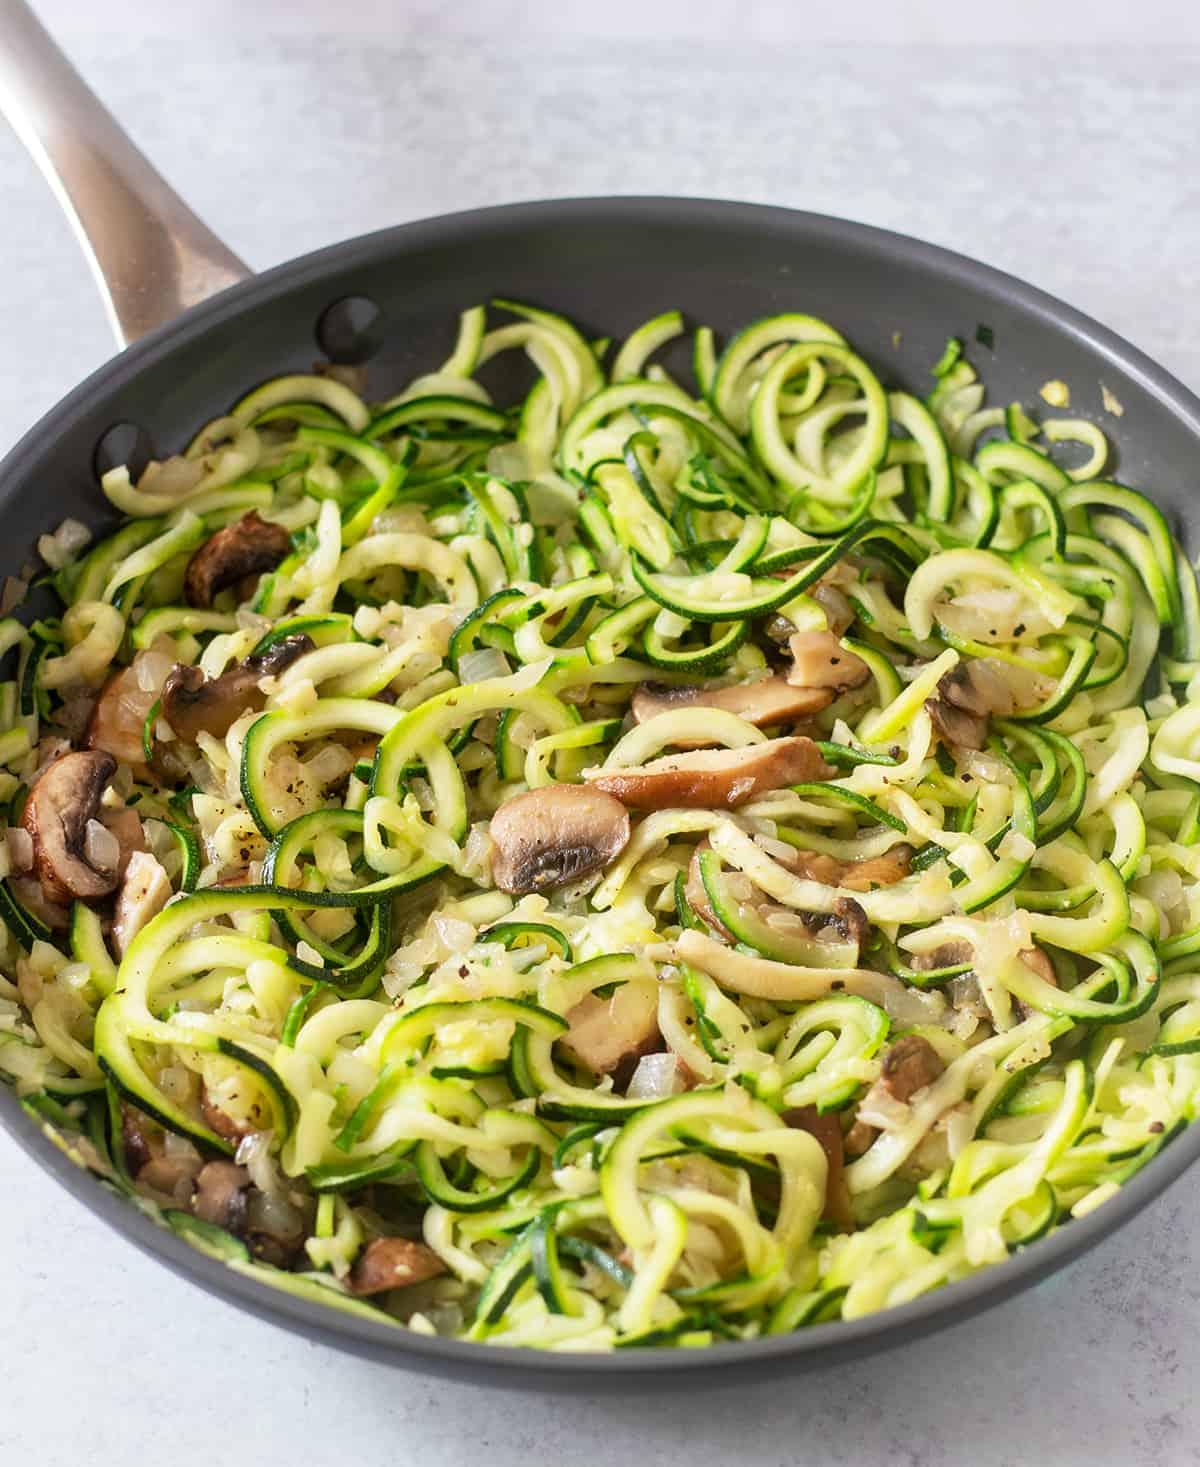 Zucchini noodles in saute pan